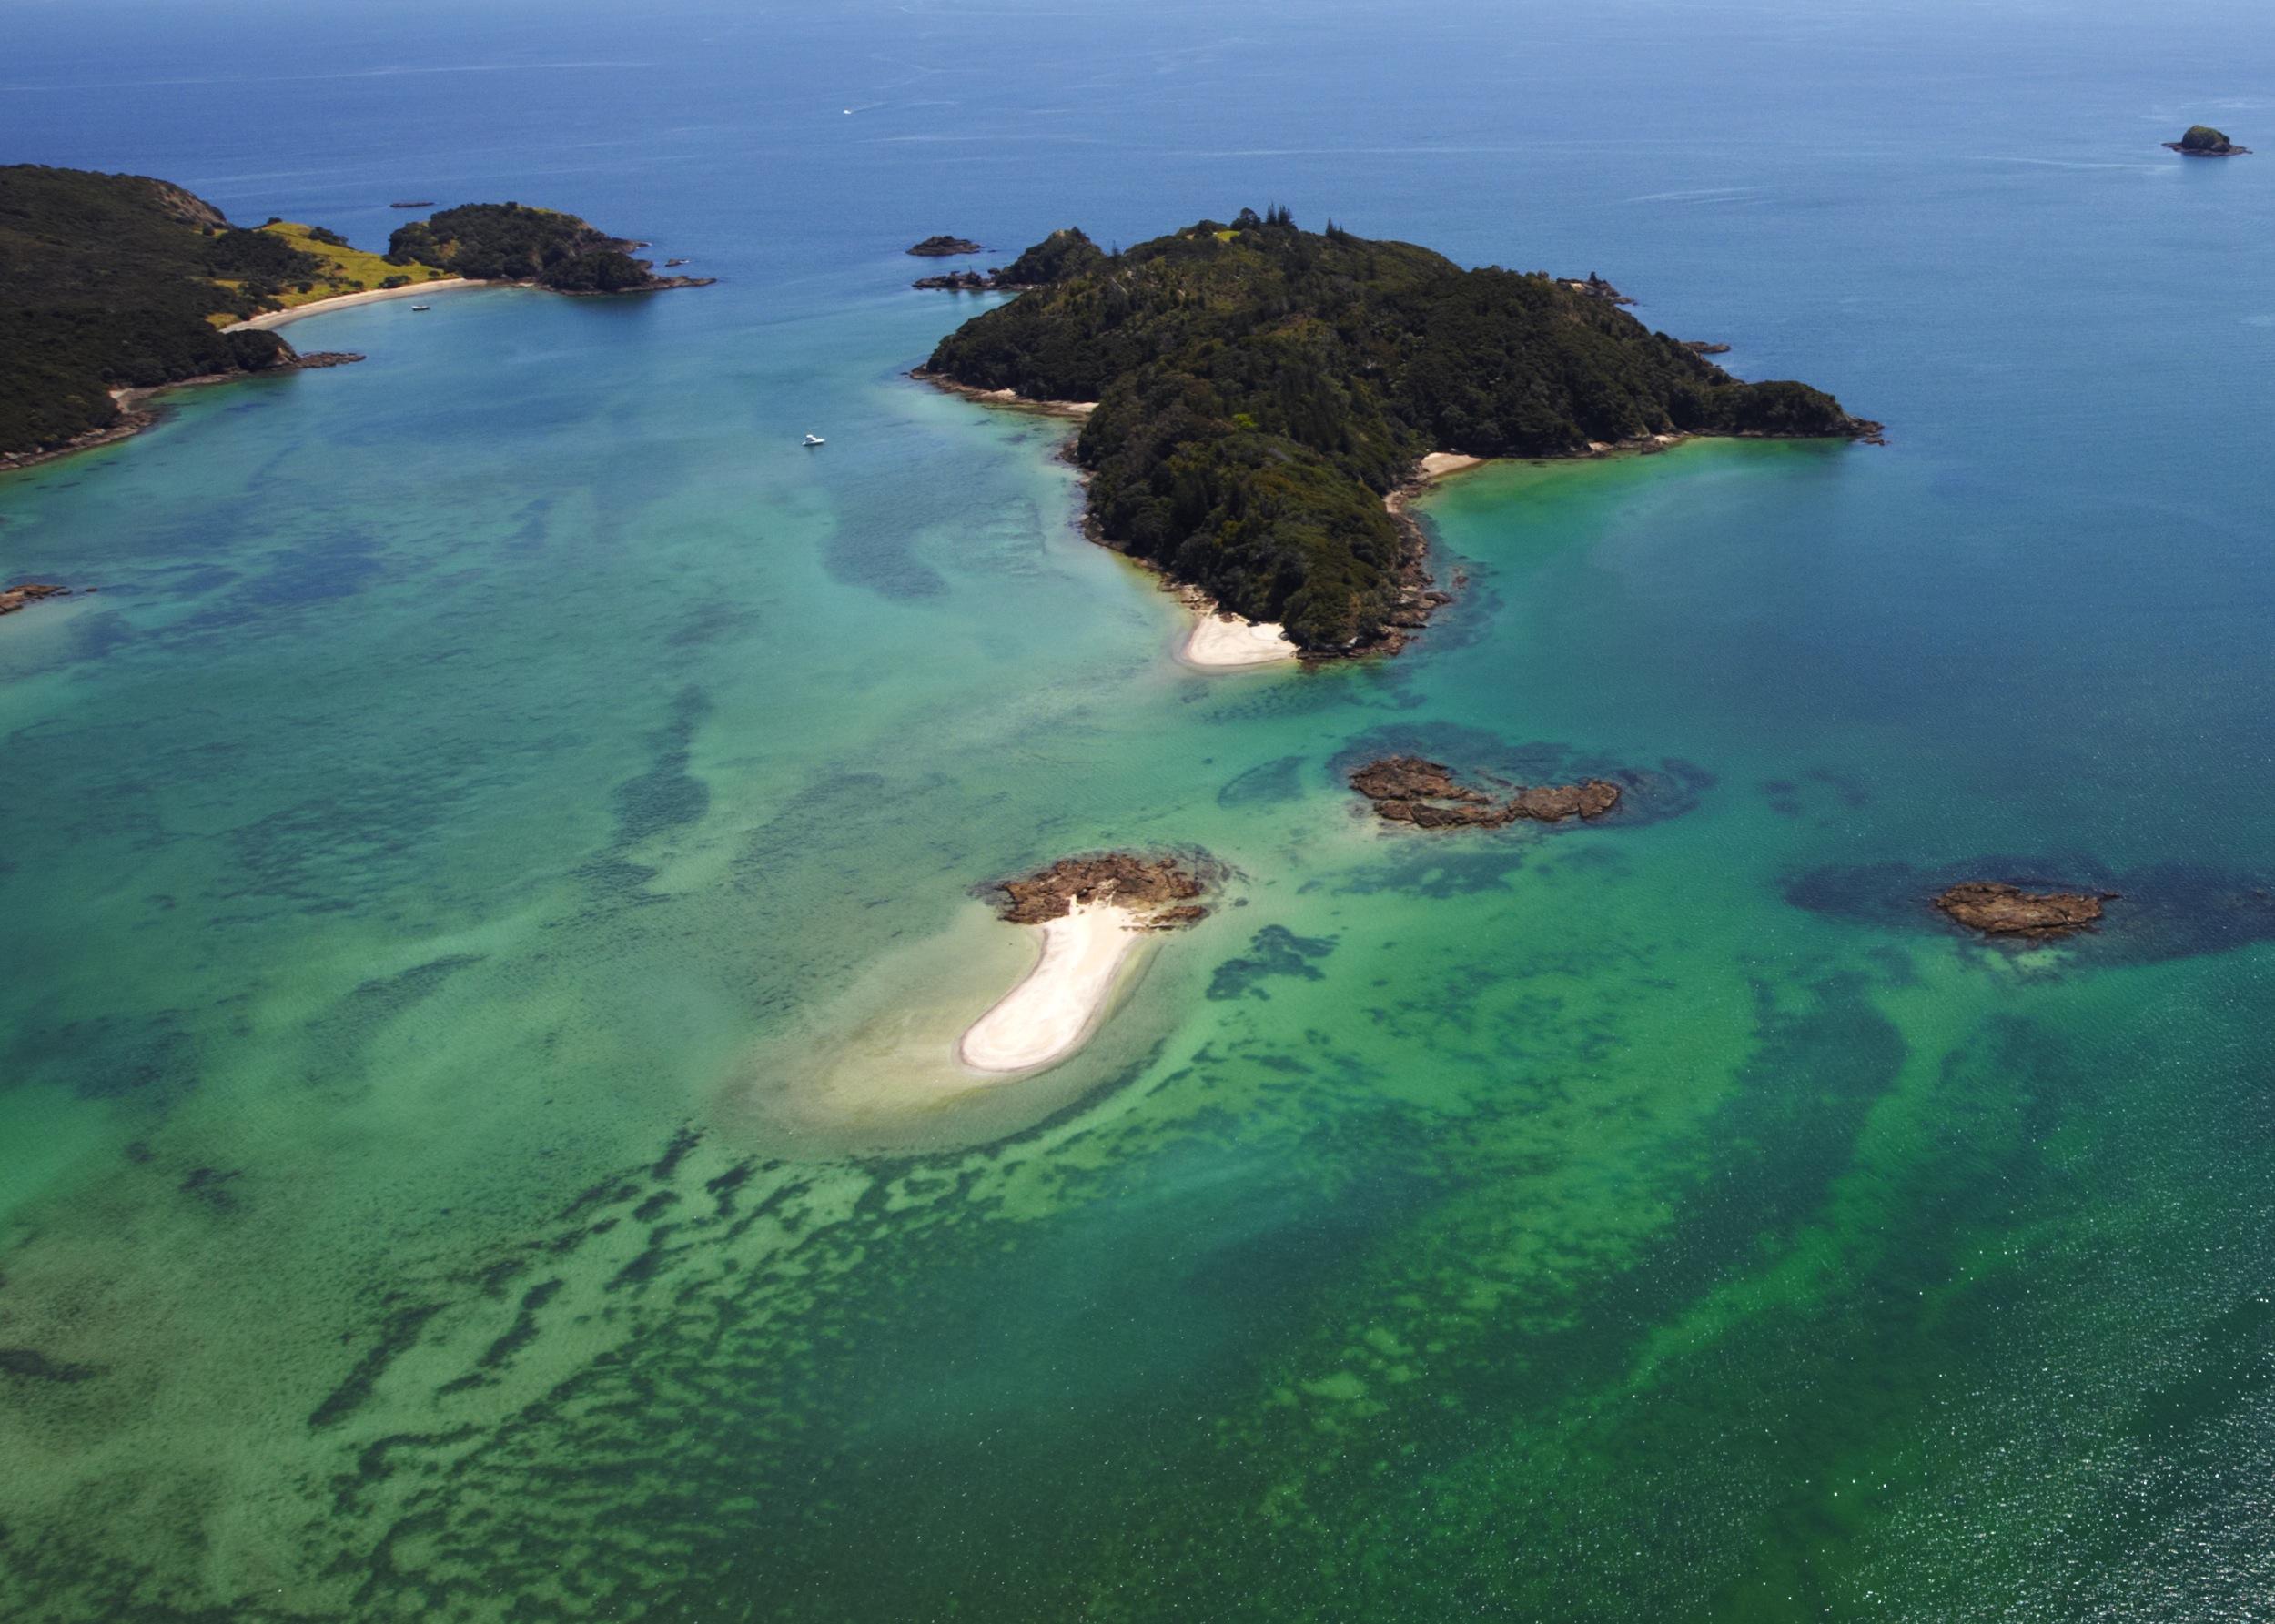 Motukiekie Island